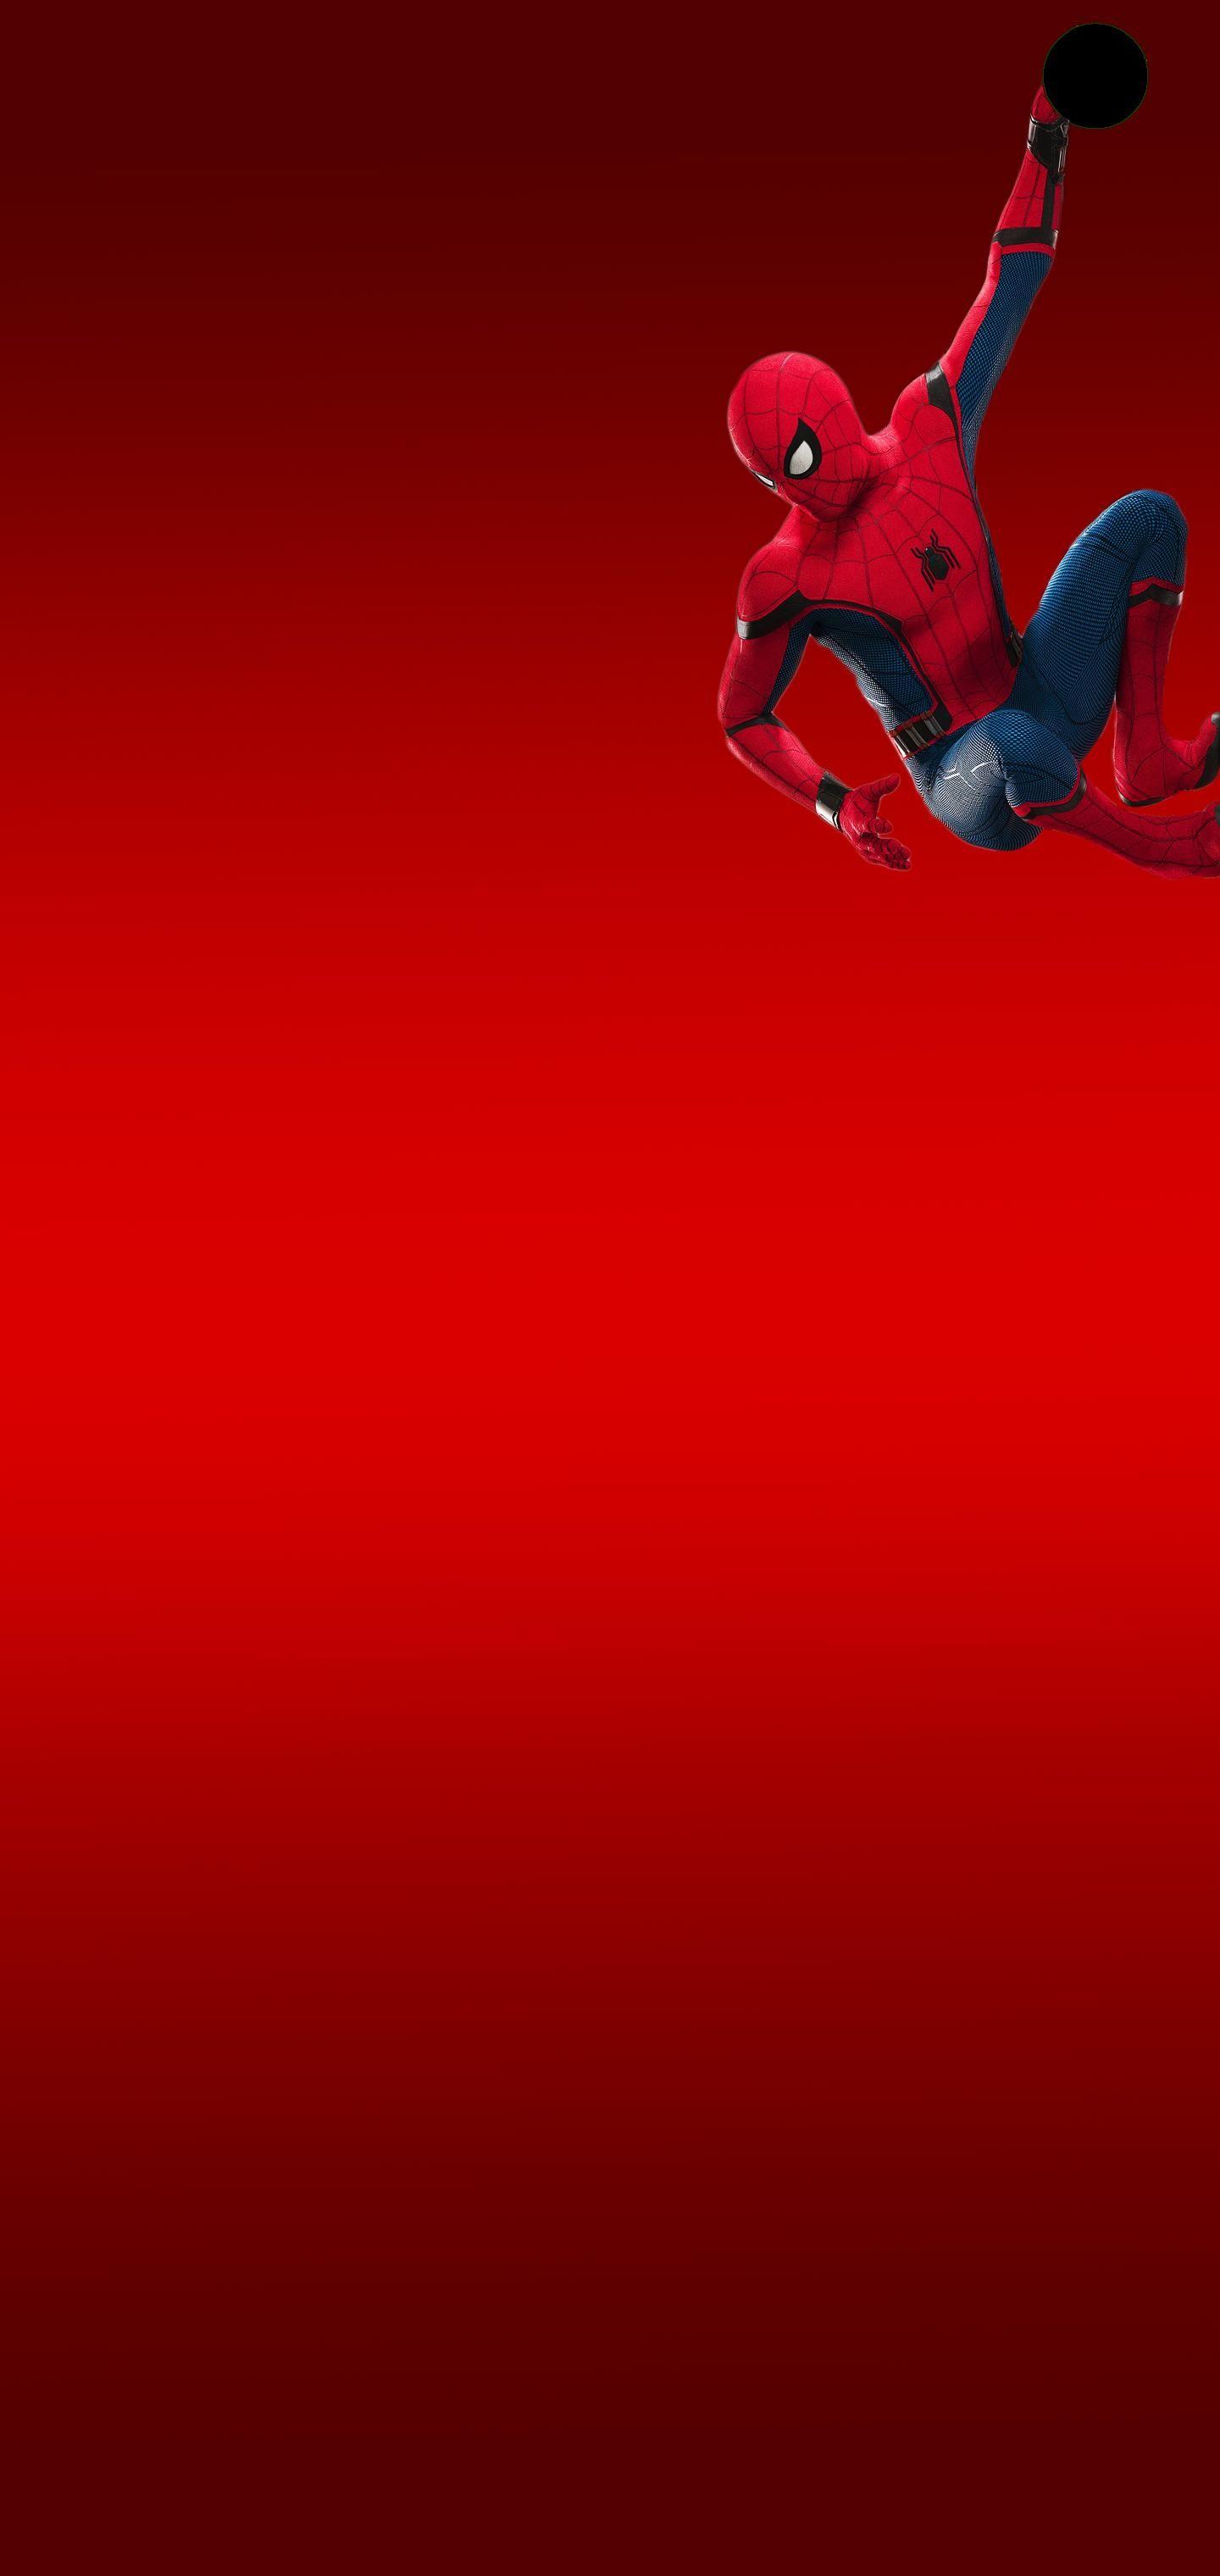 Spider-Man Hangs On 2 by JohnnySinsHDTV Galaxy S10 Hole-Punch Wallpaper